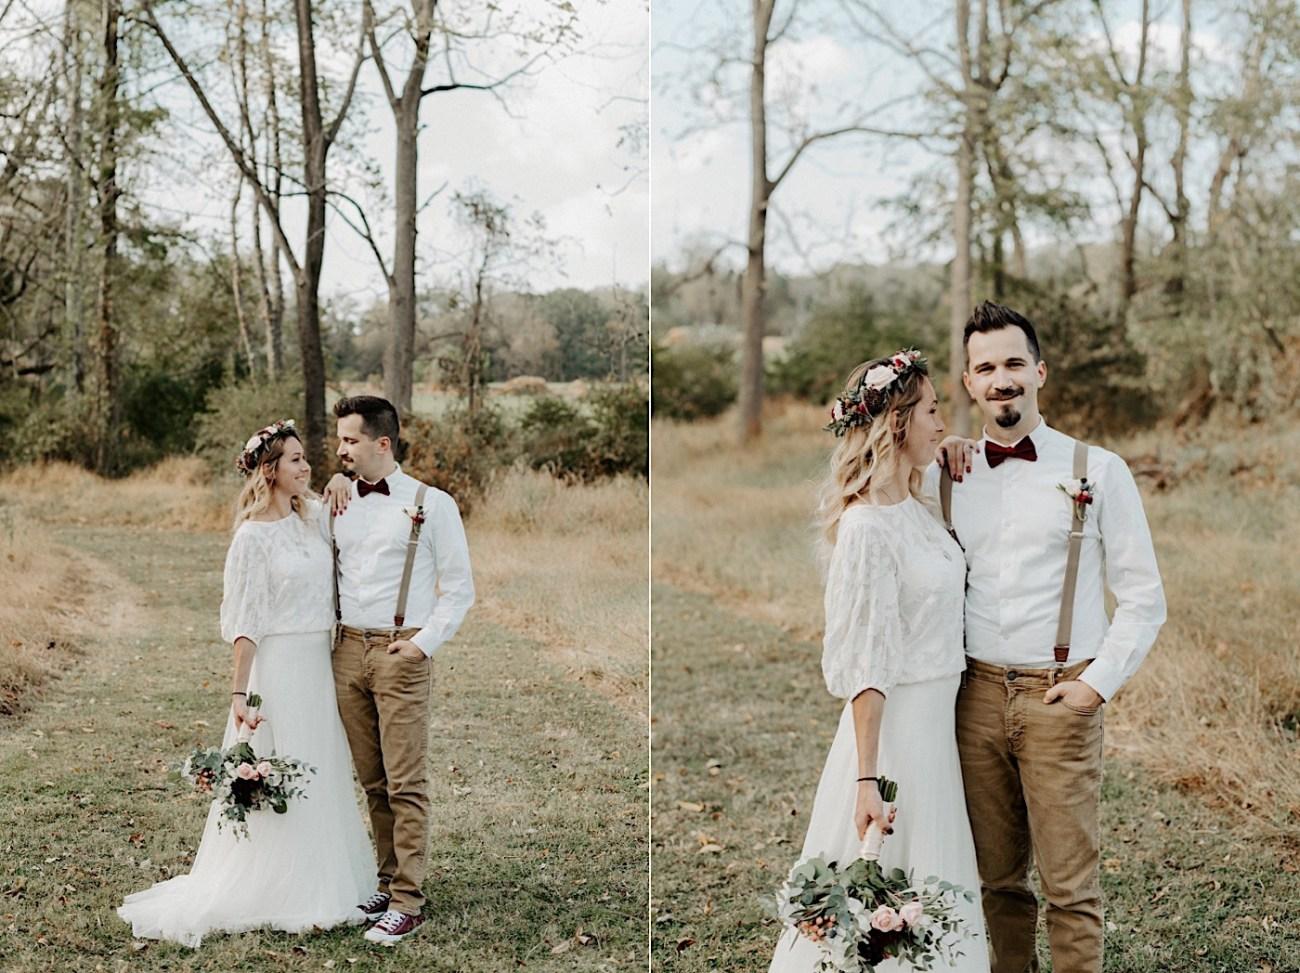 Woolverton Inn Elopement NJ Wedding Photographer Boho Wedding 011